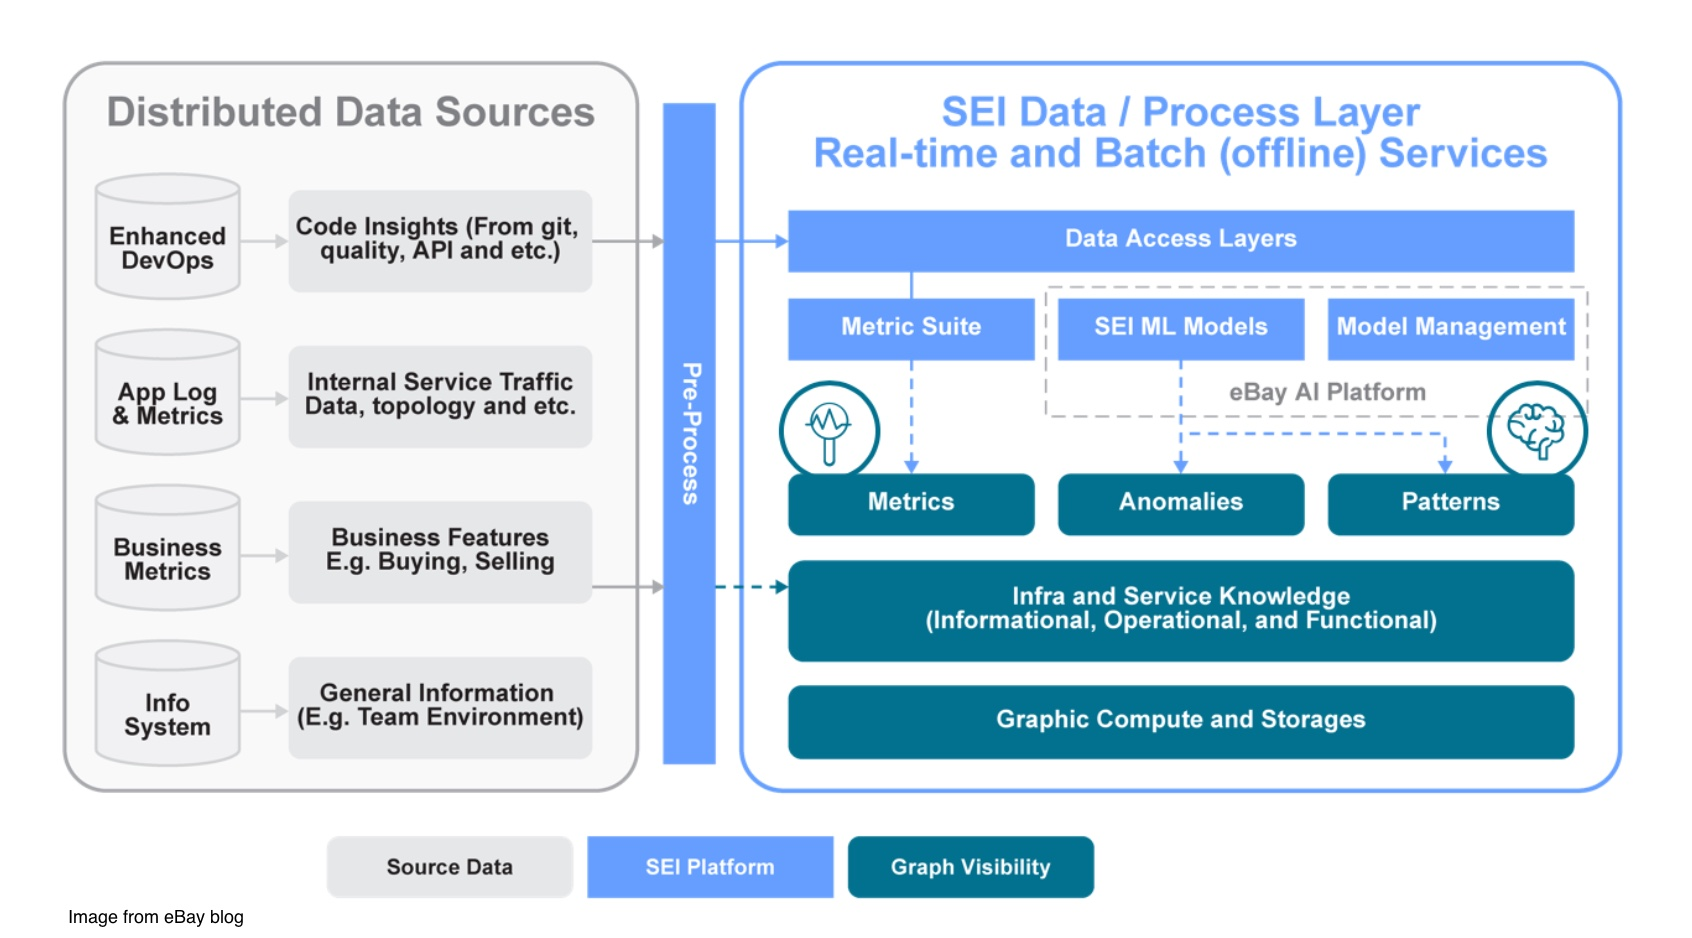 Managing Ebay Vast Service Architecture Using Knowledge Graphs